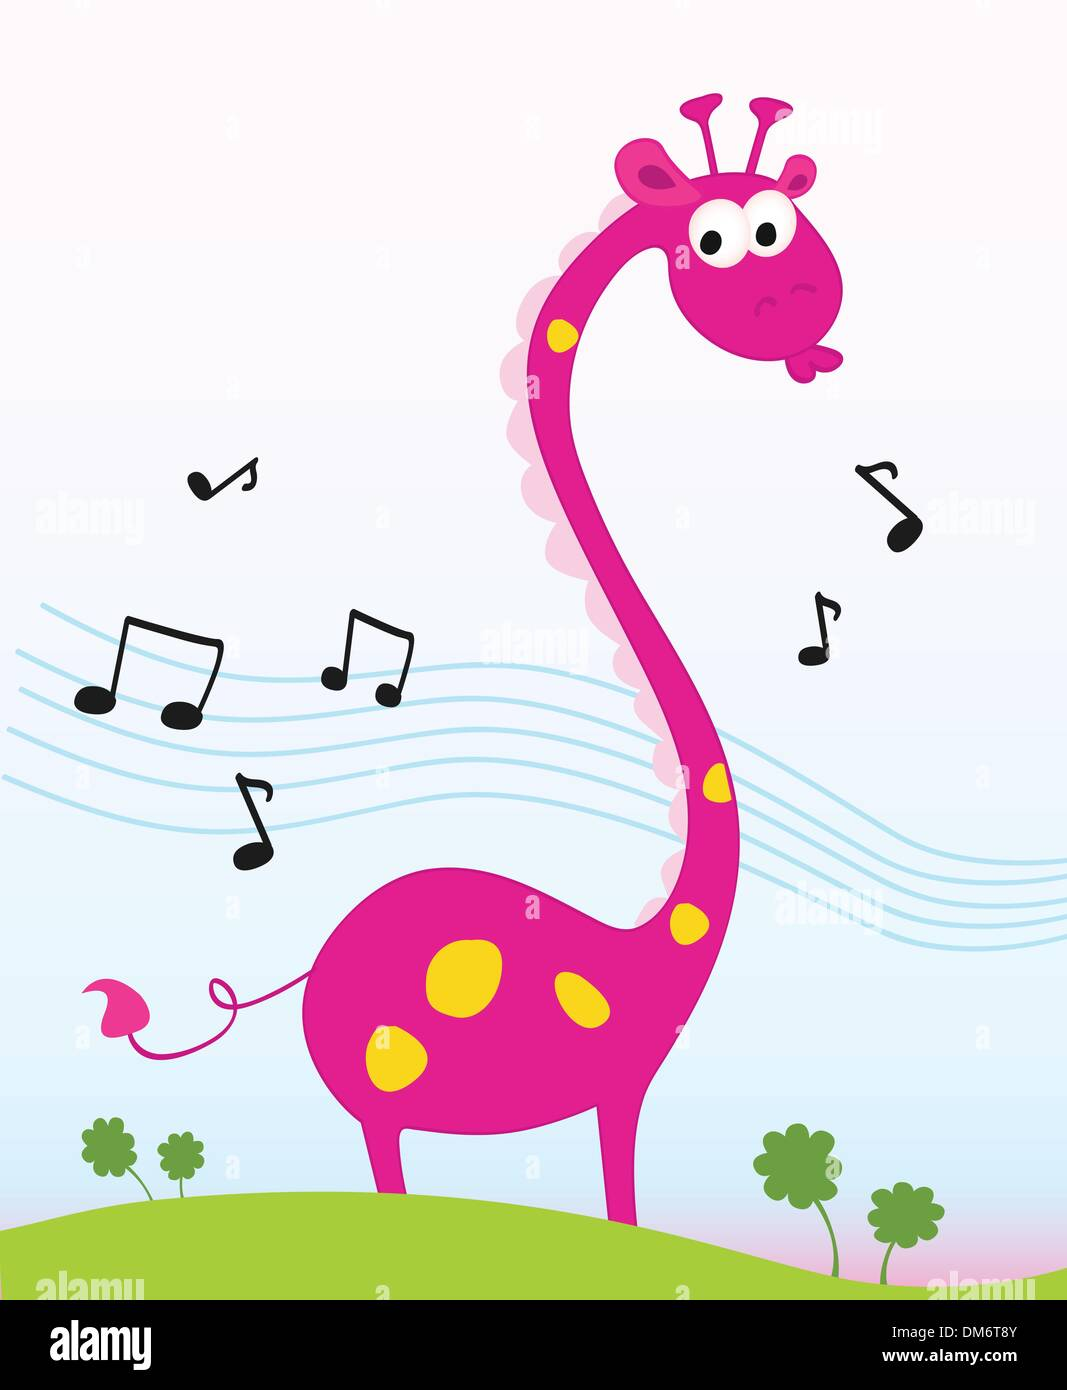 Giraffe Sound Stock Photos & Giraffe Sound Stock Images - Alamy